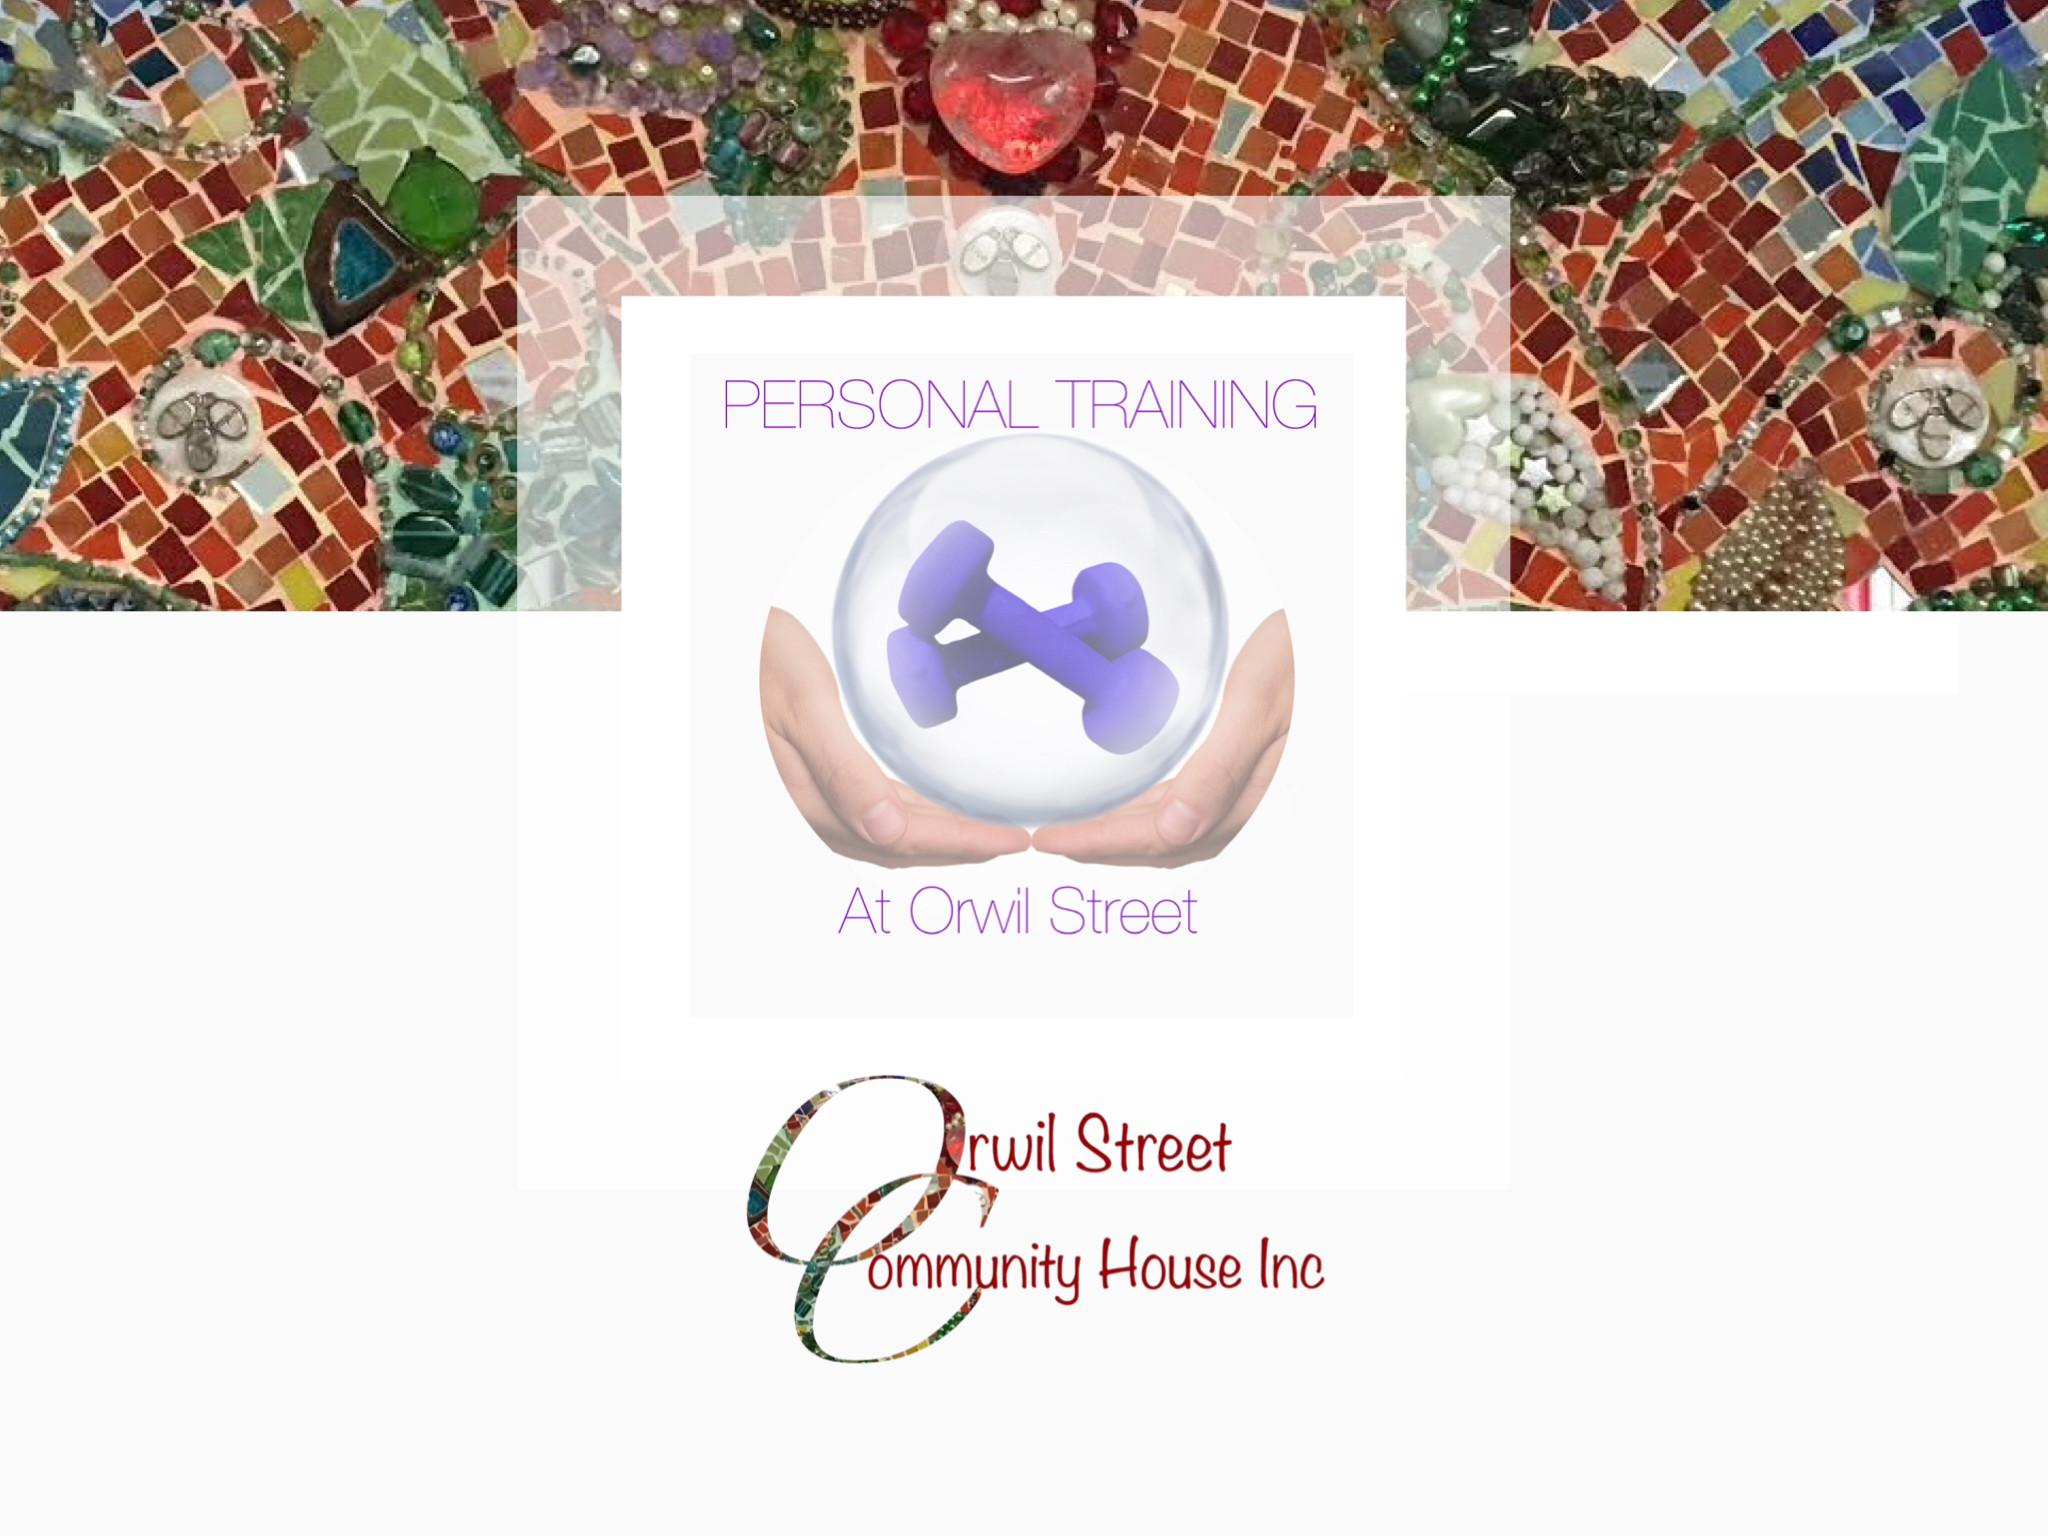 Personal Training at Orwil Street